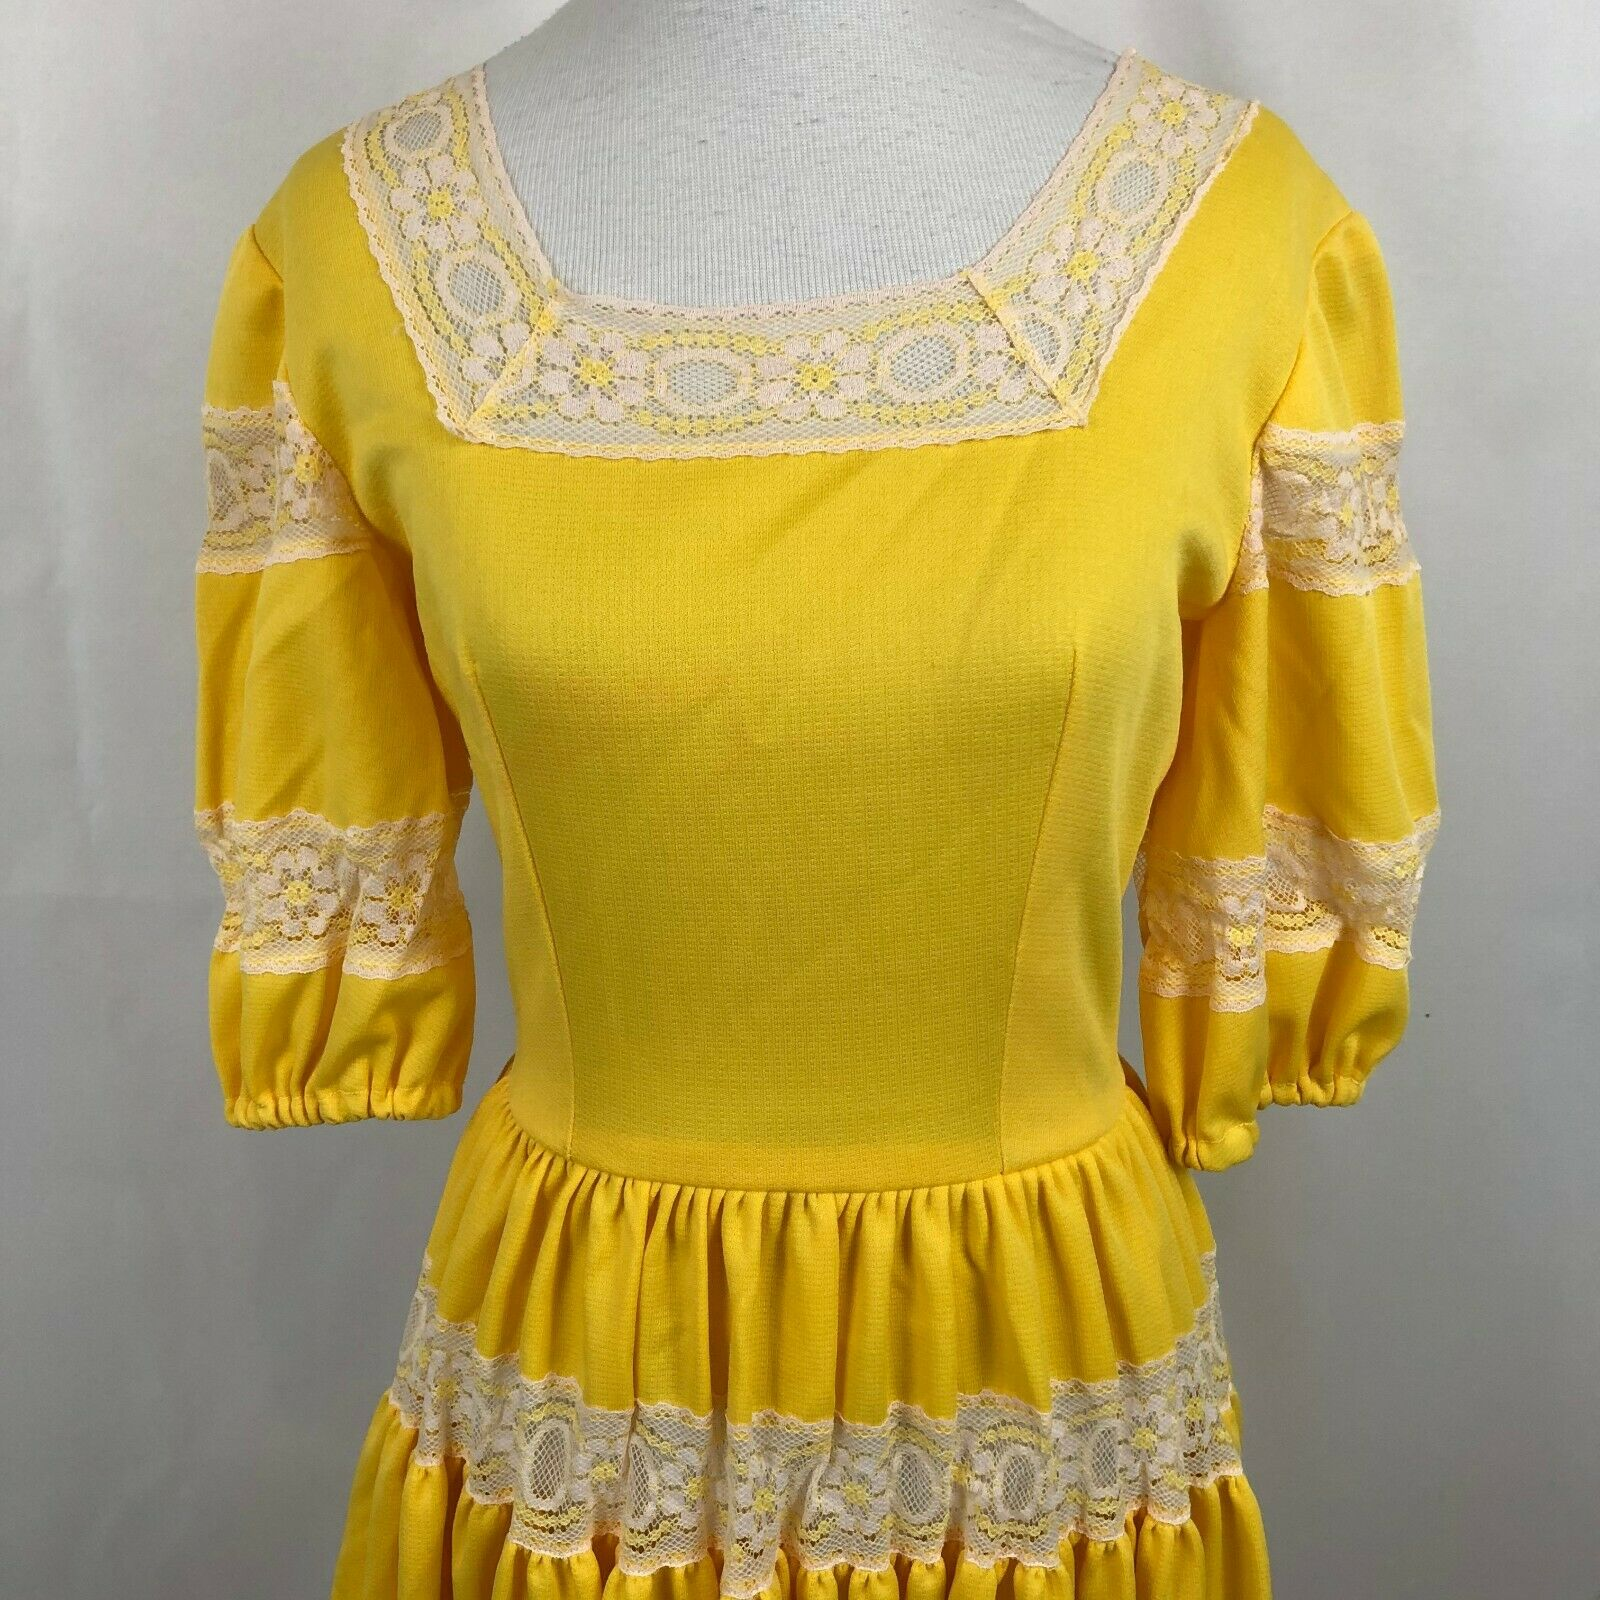 Vintage Lolita Dress Bright Yellow S/M See measur… - image 2